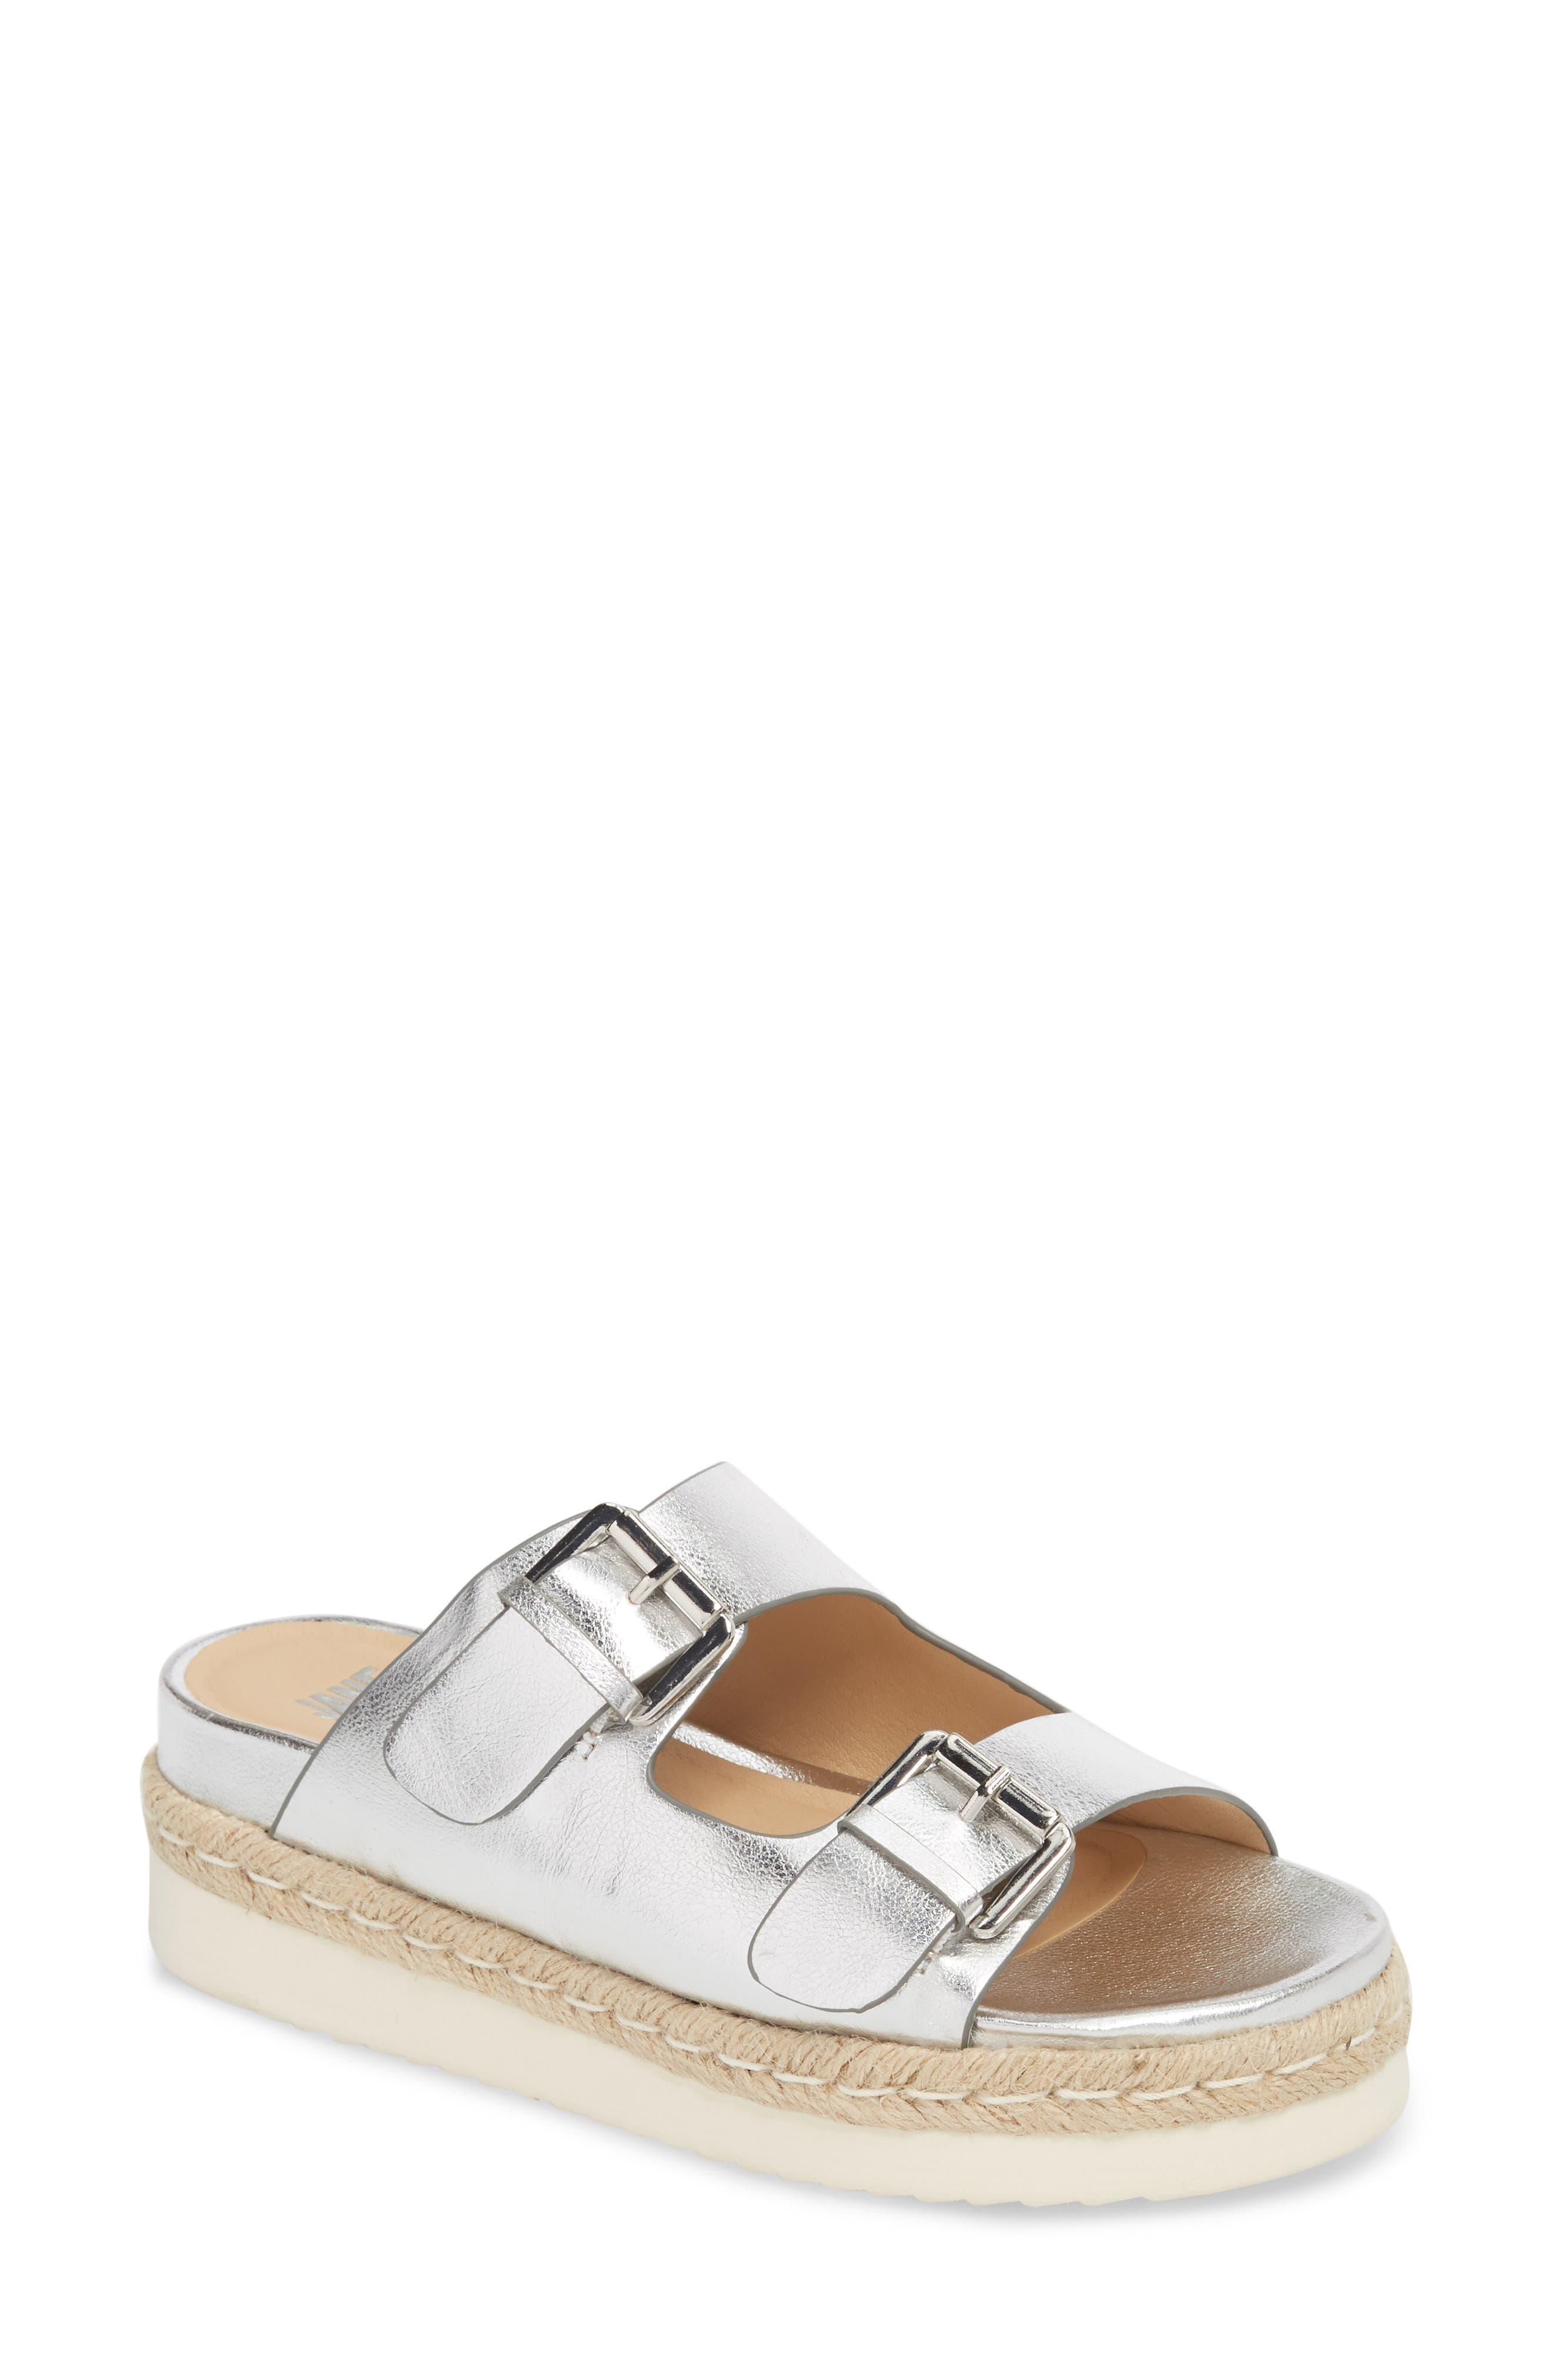 Jojo Two-Buckle Slide Sandal,                         Main,                         color, Silver